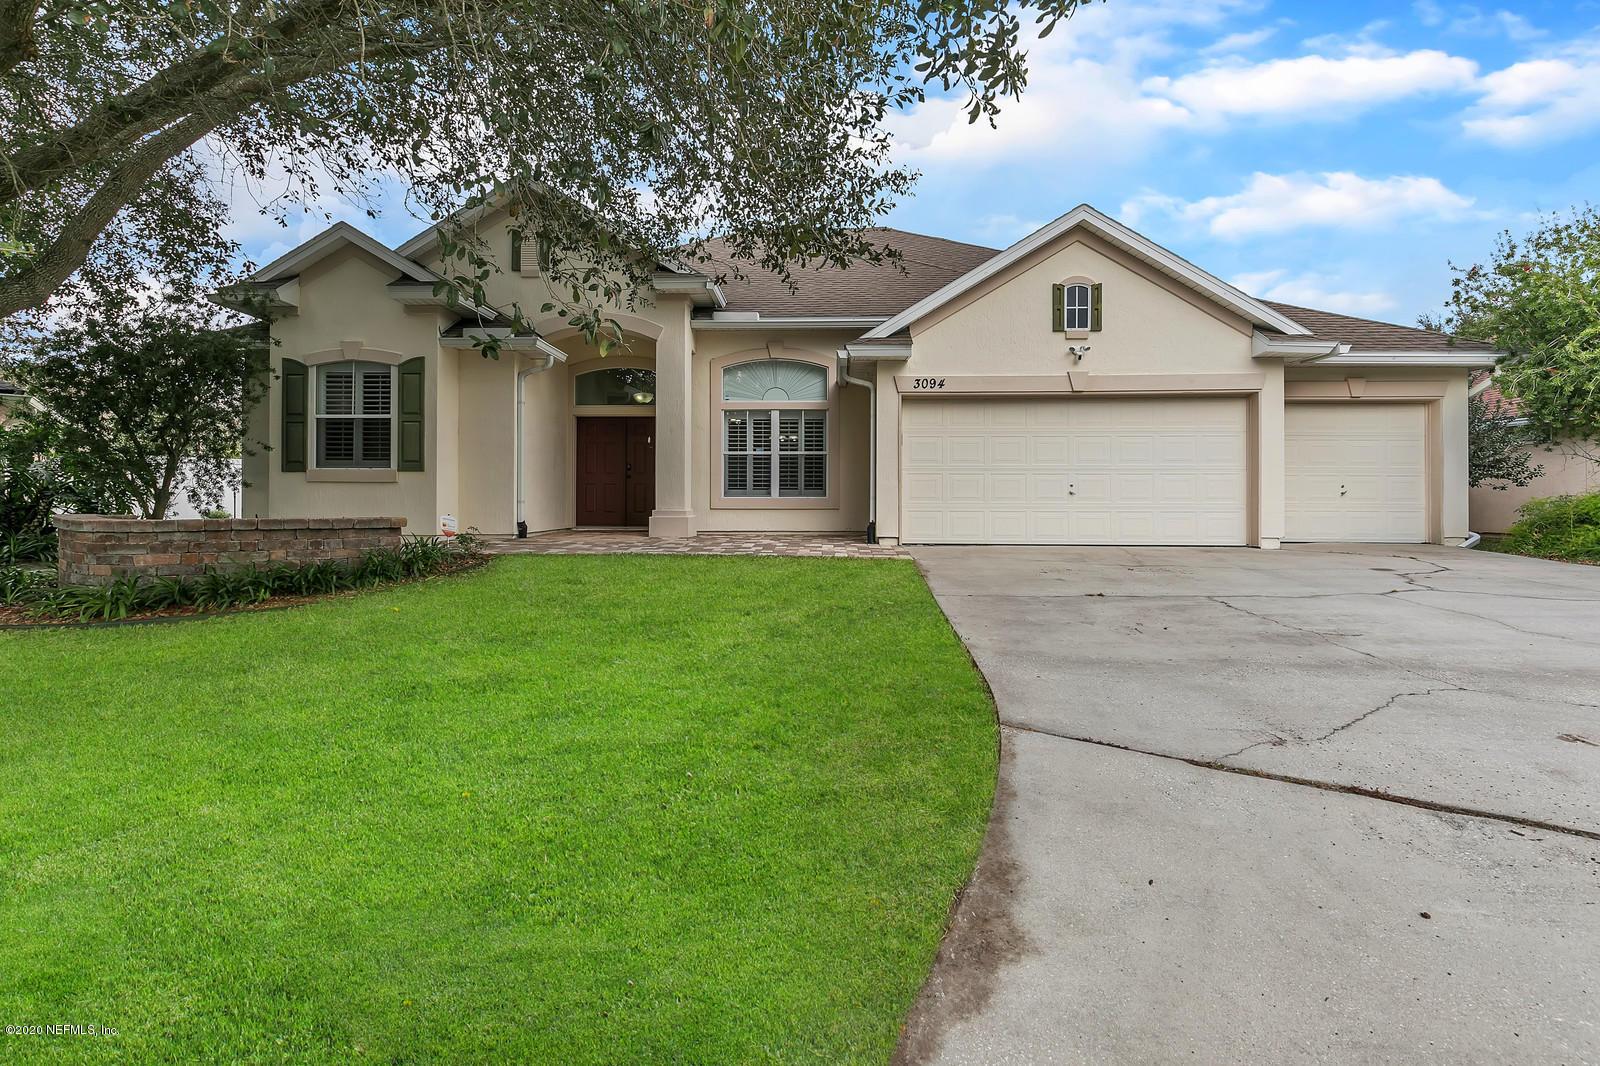 3094 LYNNHAVEN, ORANGE PARK, FLORIDA 32065, 4 Bedrooms Bedrooms, ,3 BathroomsBathrooms,Residential,For sale,LYNNHAVEN,1034991